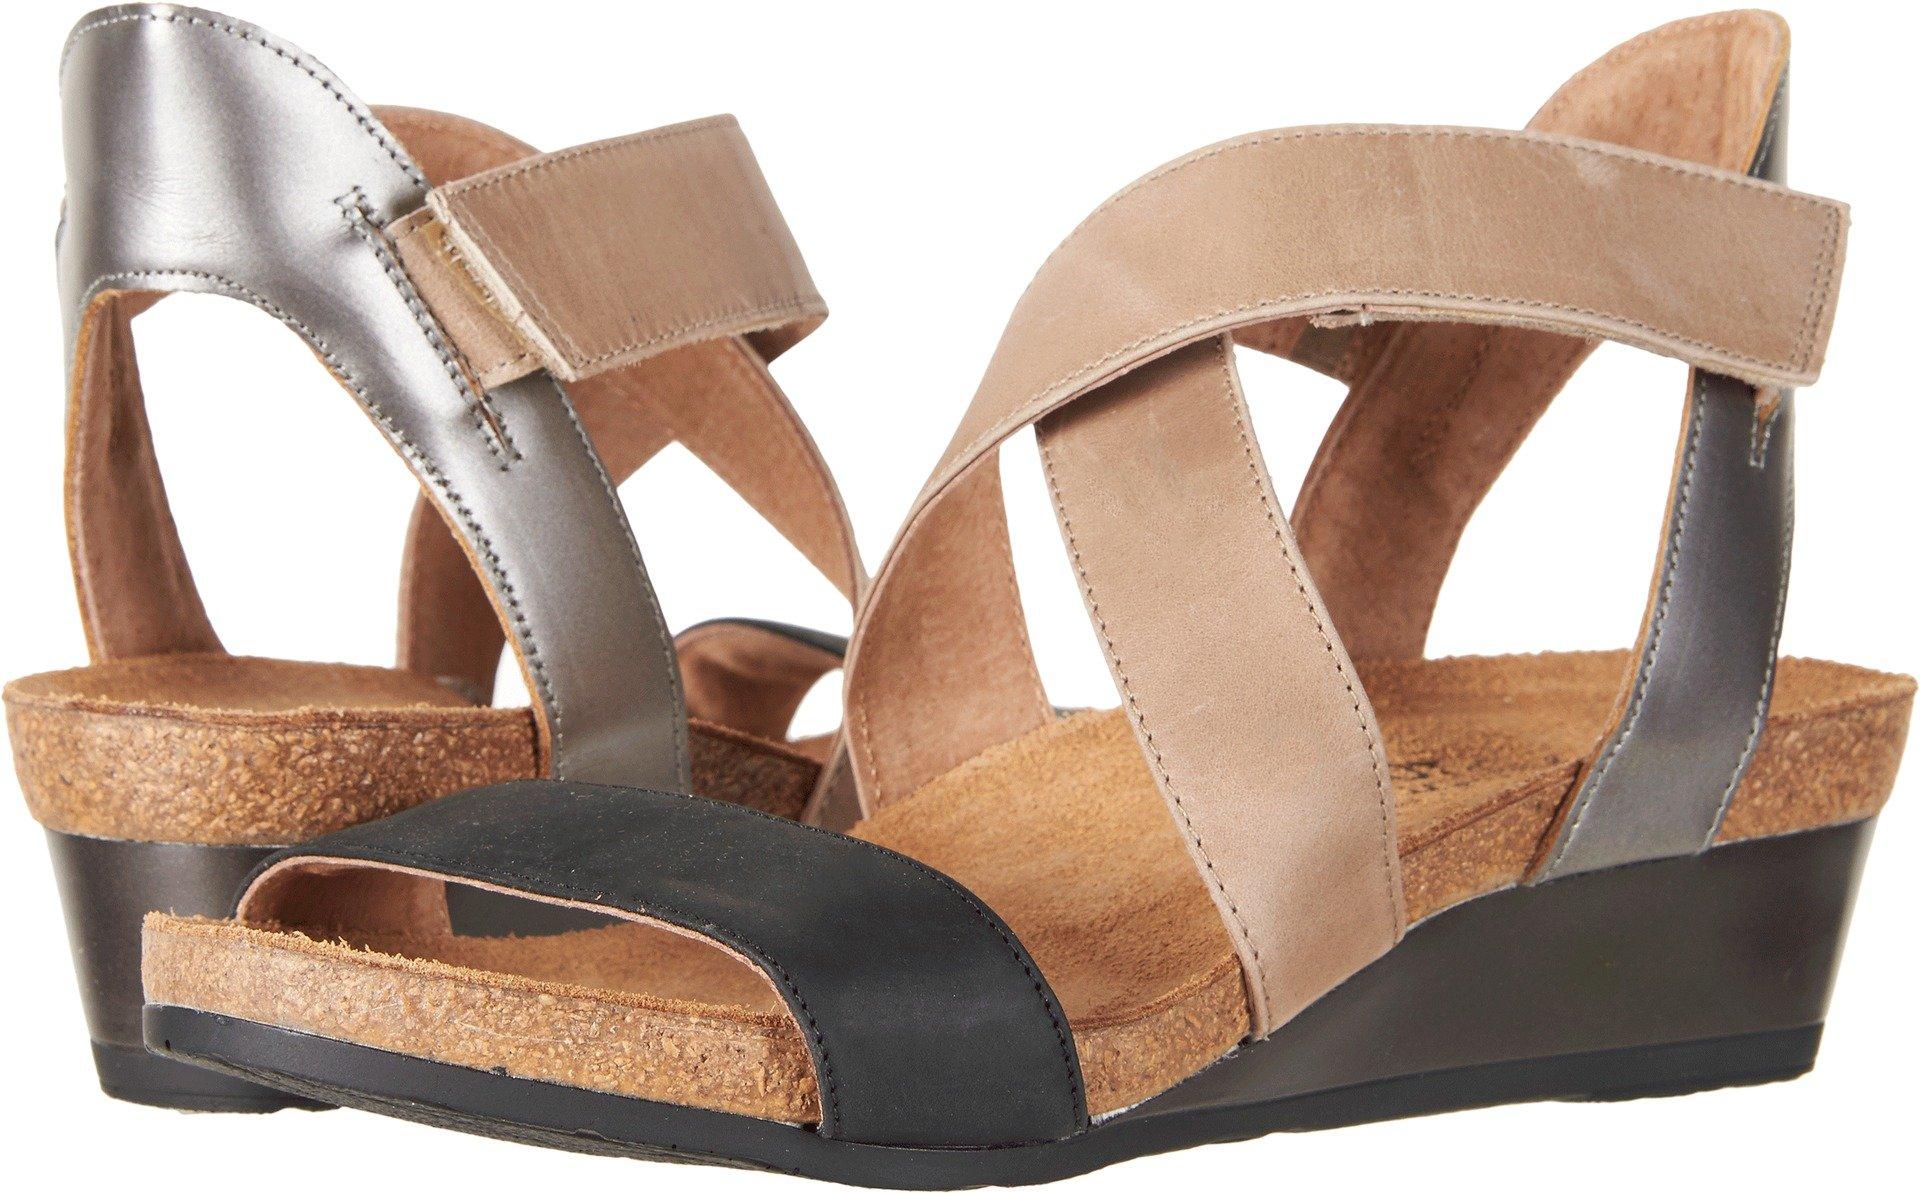 NAOT Women's Vixen Oily Coal Nubuck/Khaki/Beige Leather/Mirror Leather 37 M EU